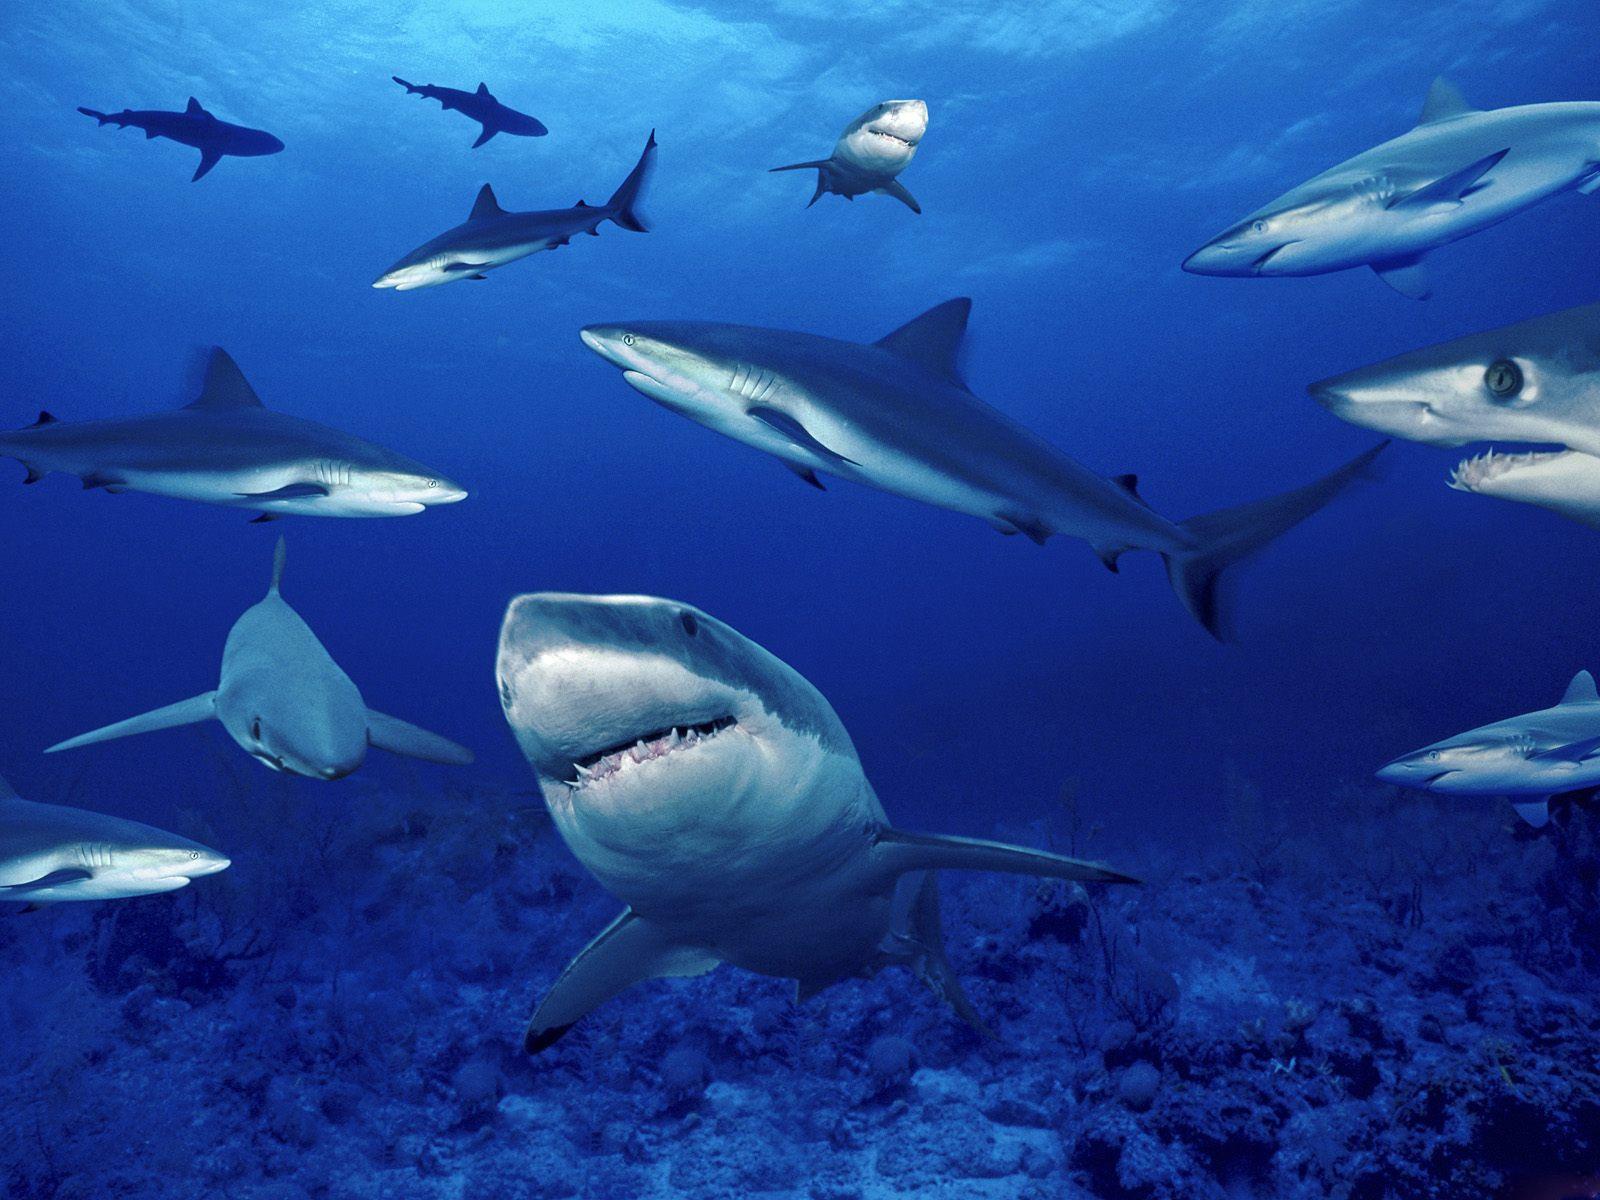 http://1.bp.blogspot.com/-TdtRc6c4xPw/TkrUKF4drQI/AAAAAAAALlM/Rv2kZowEaGw/s1600/Underwater+Wallpapers+%252831%2529.jpg